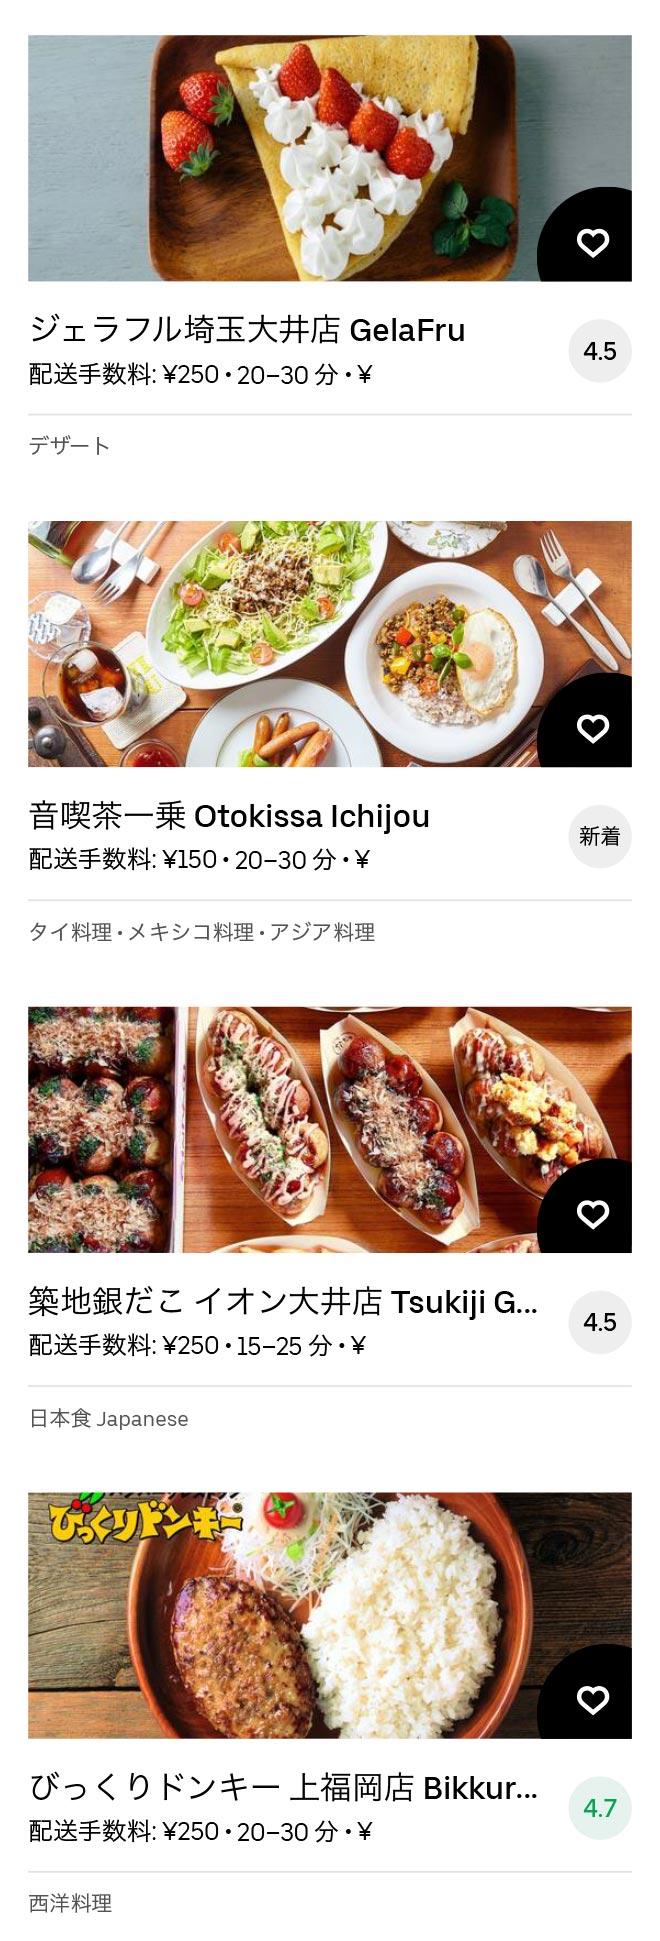 Kamifukuoka menu 2011 09